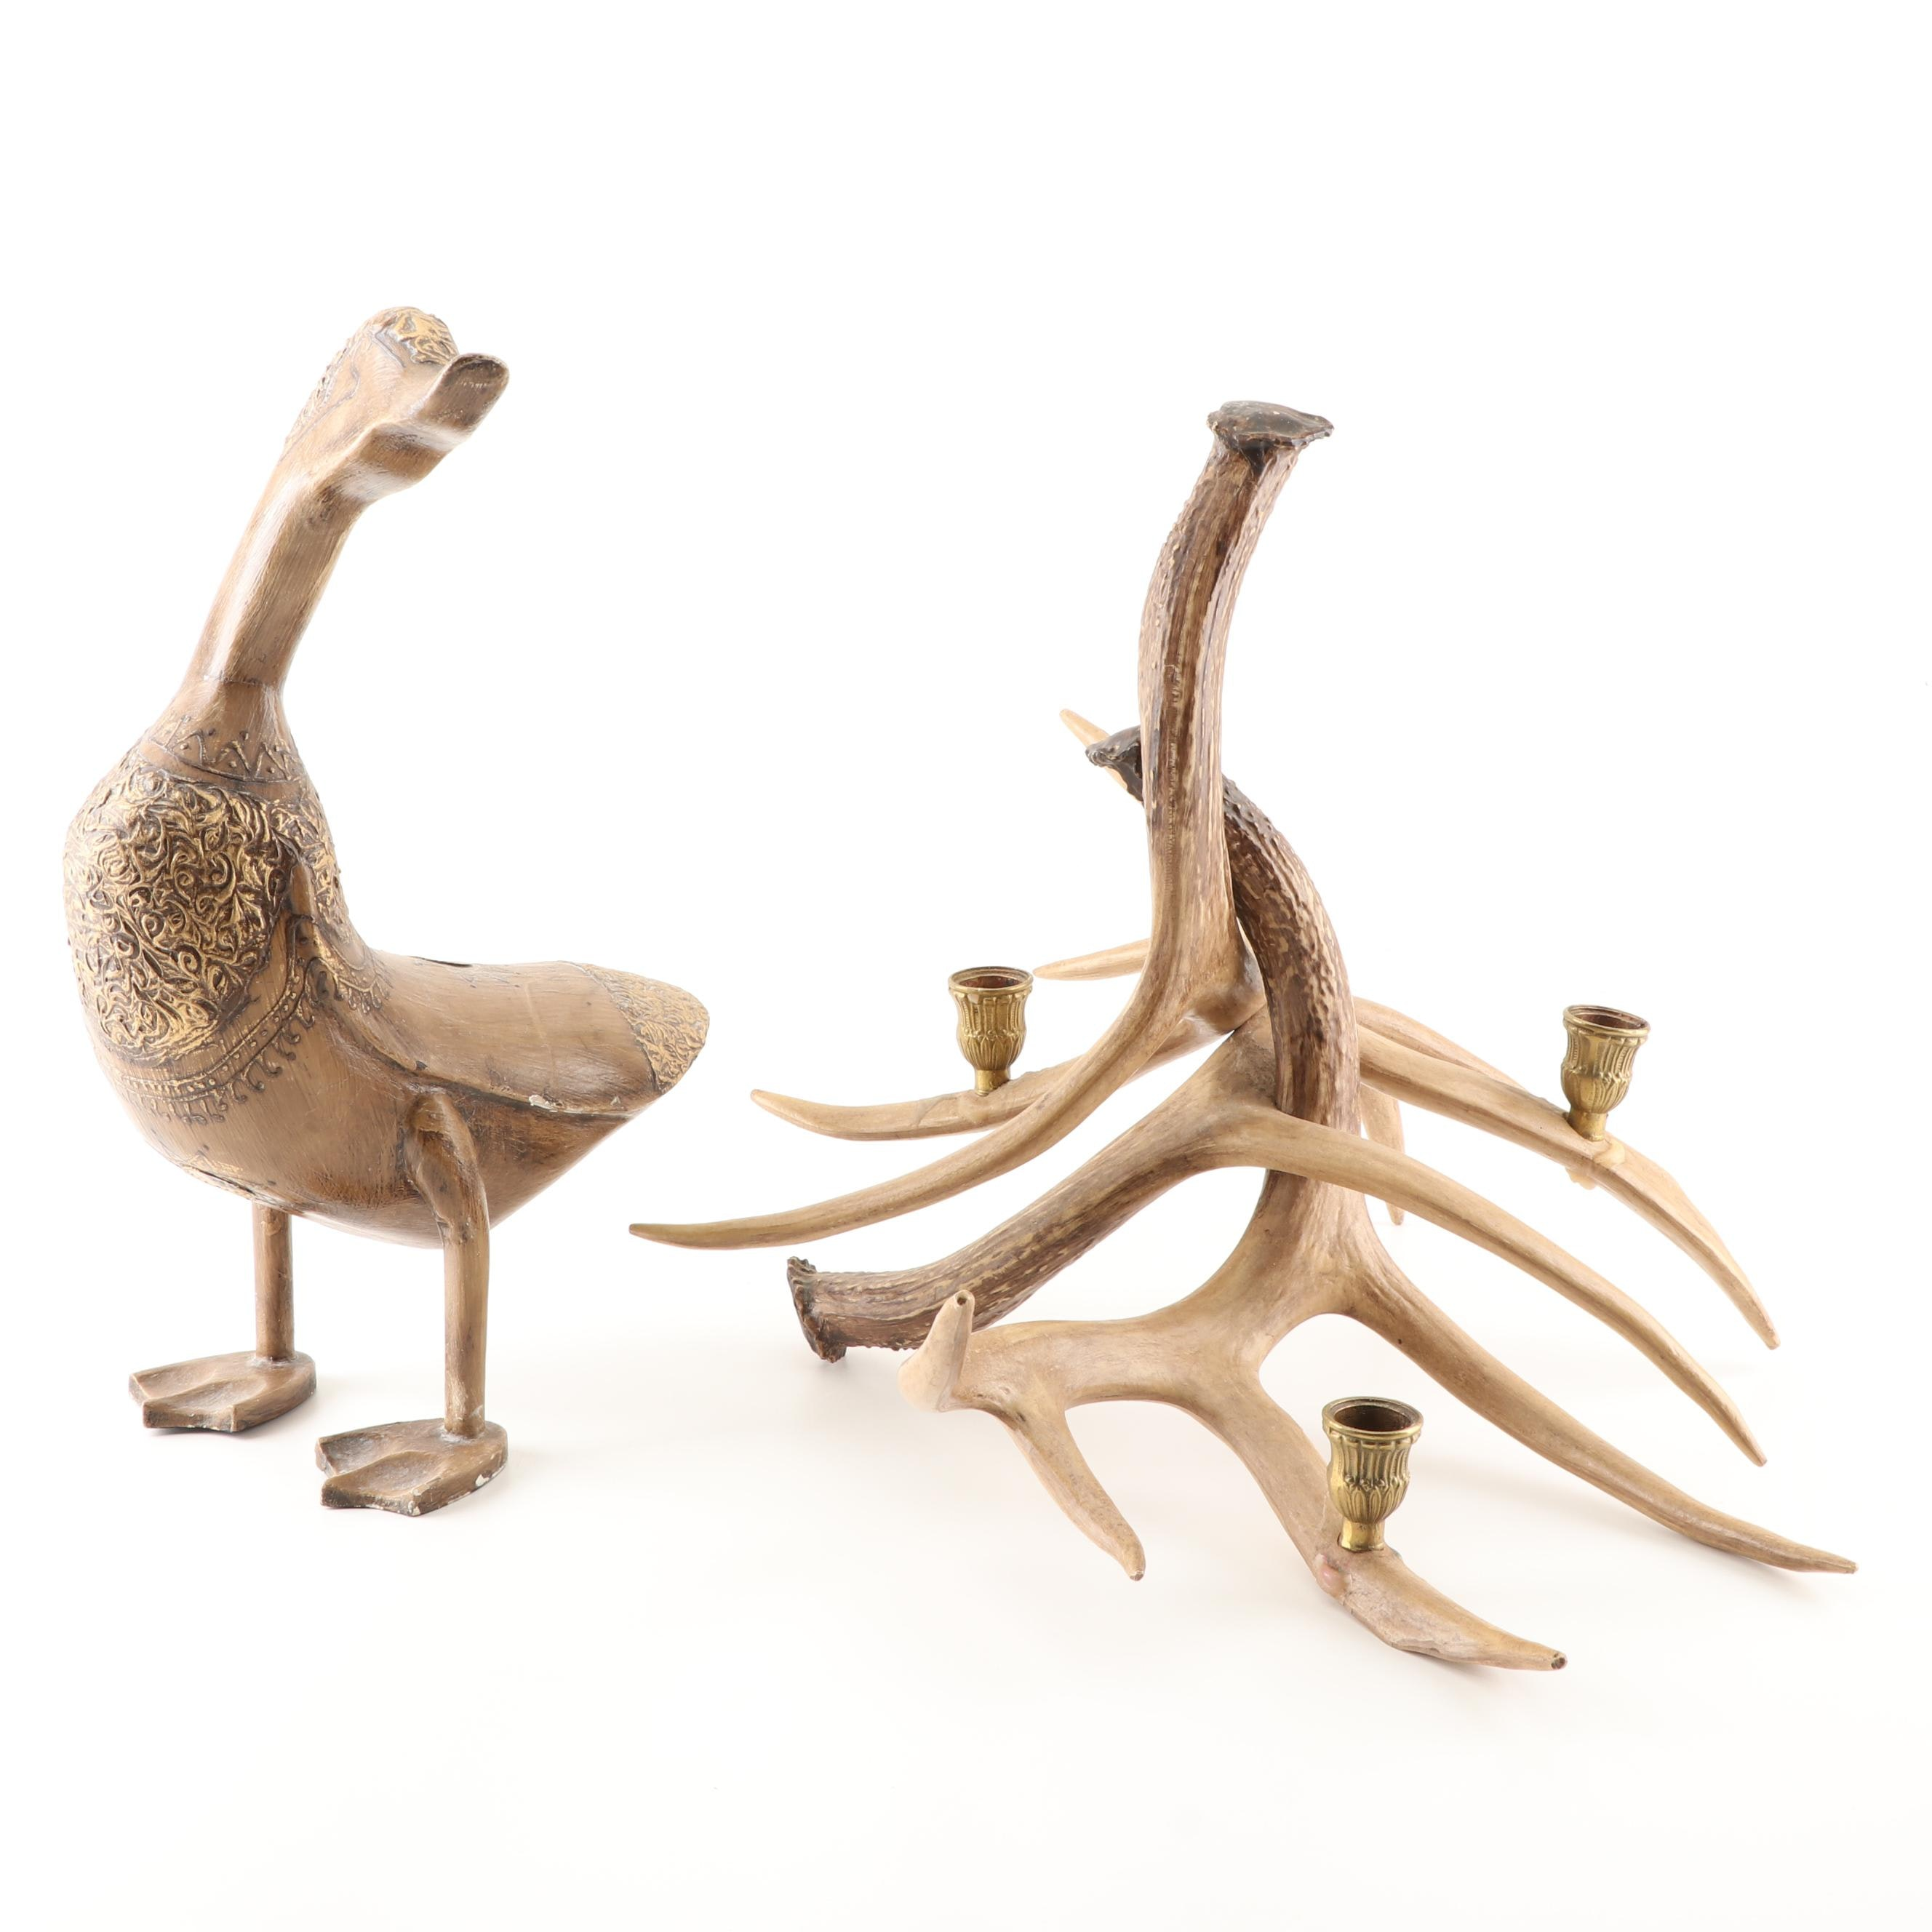 Resin Antler Candelabra and Duck Figurine